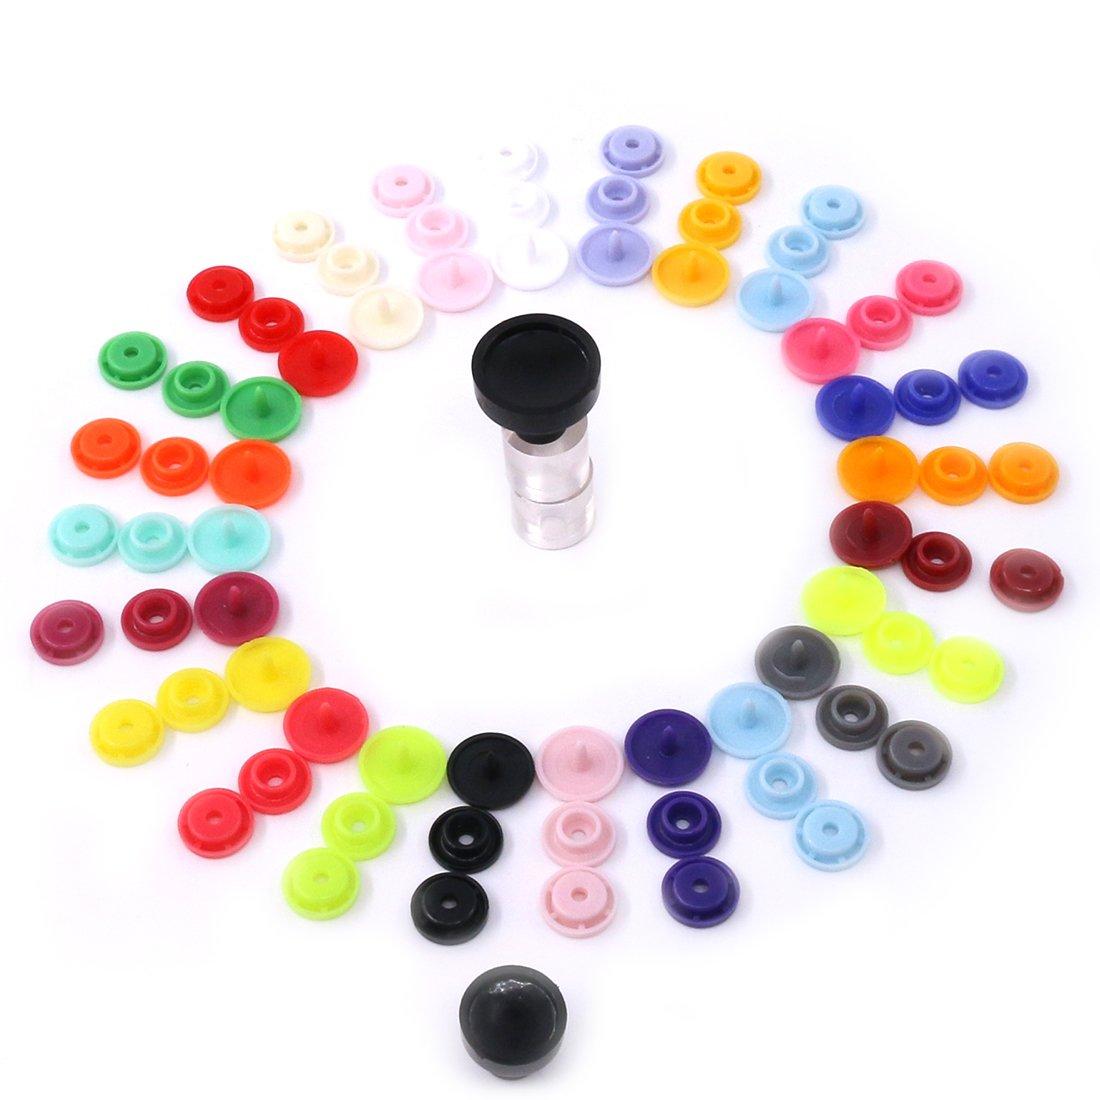 Glarks 384pcs T5 KAM Snaps Botones de plástico con broches de presión alicates Set para costura de ropa, baberos, abrigo de lluvia manualidades: Amazon.es: ...